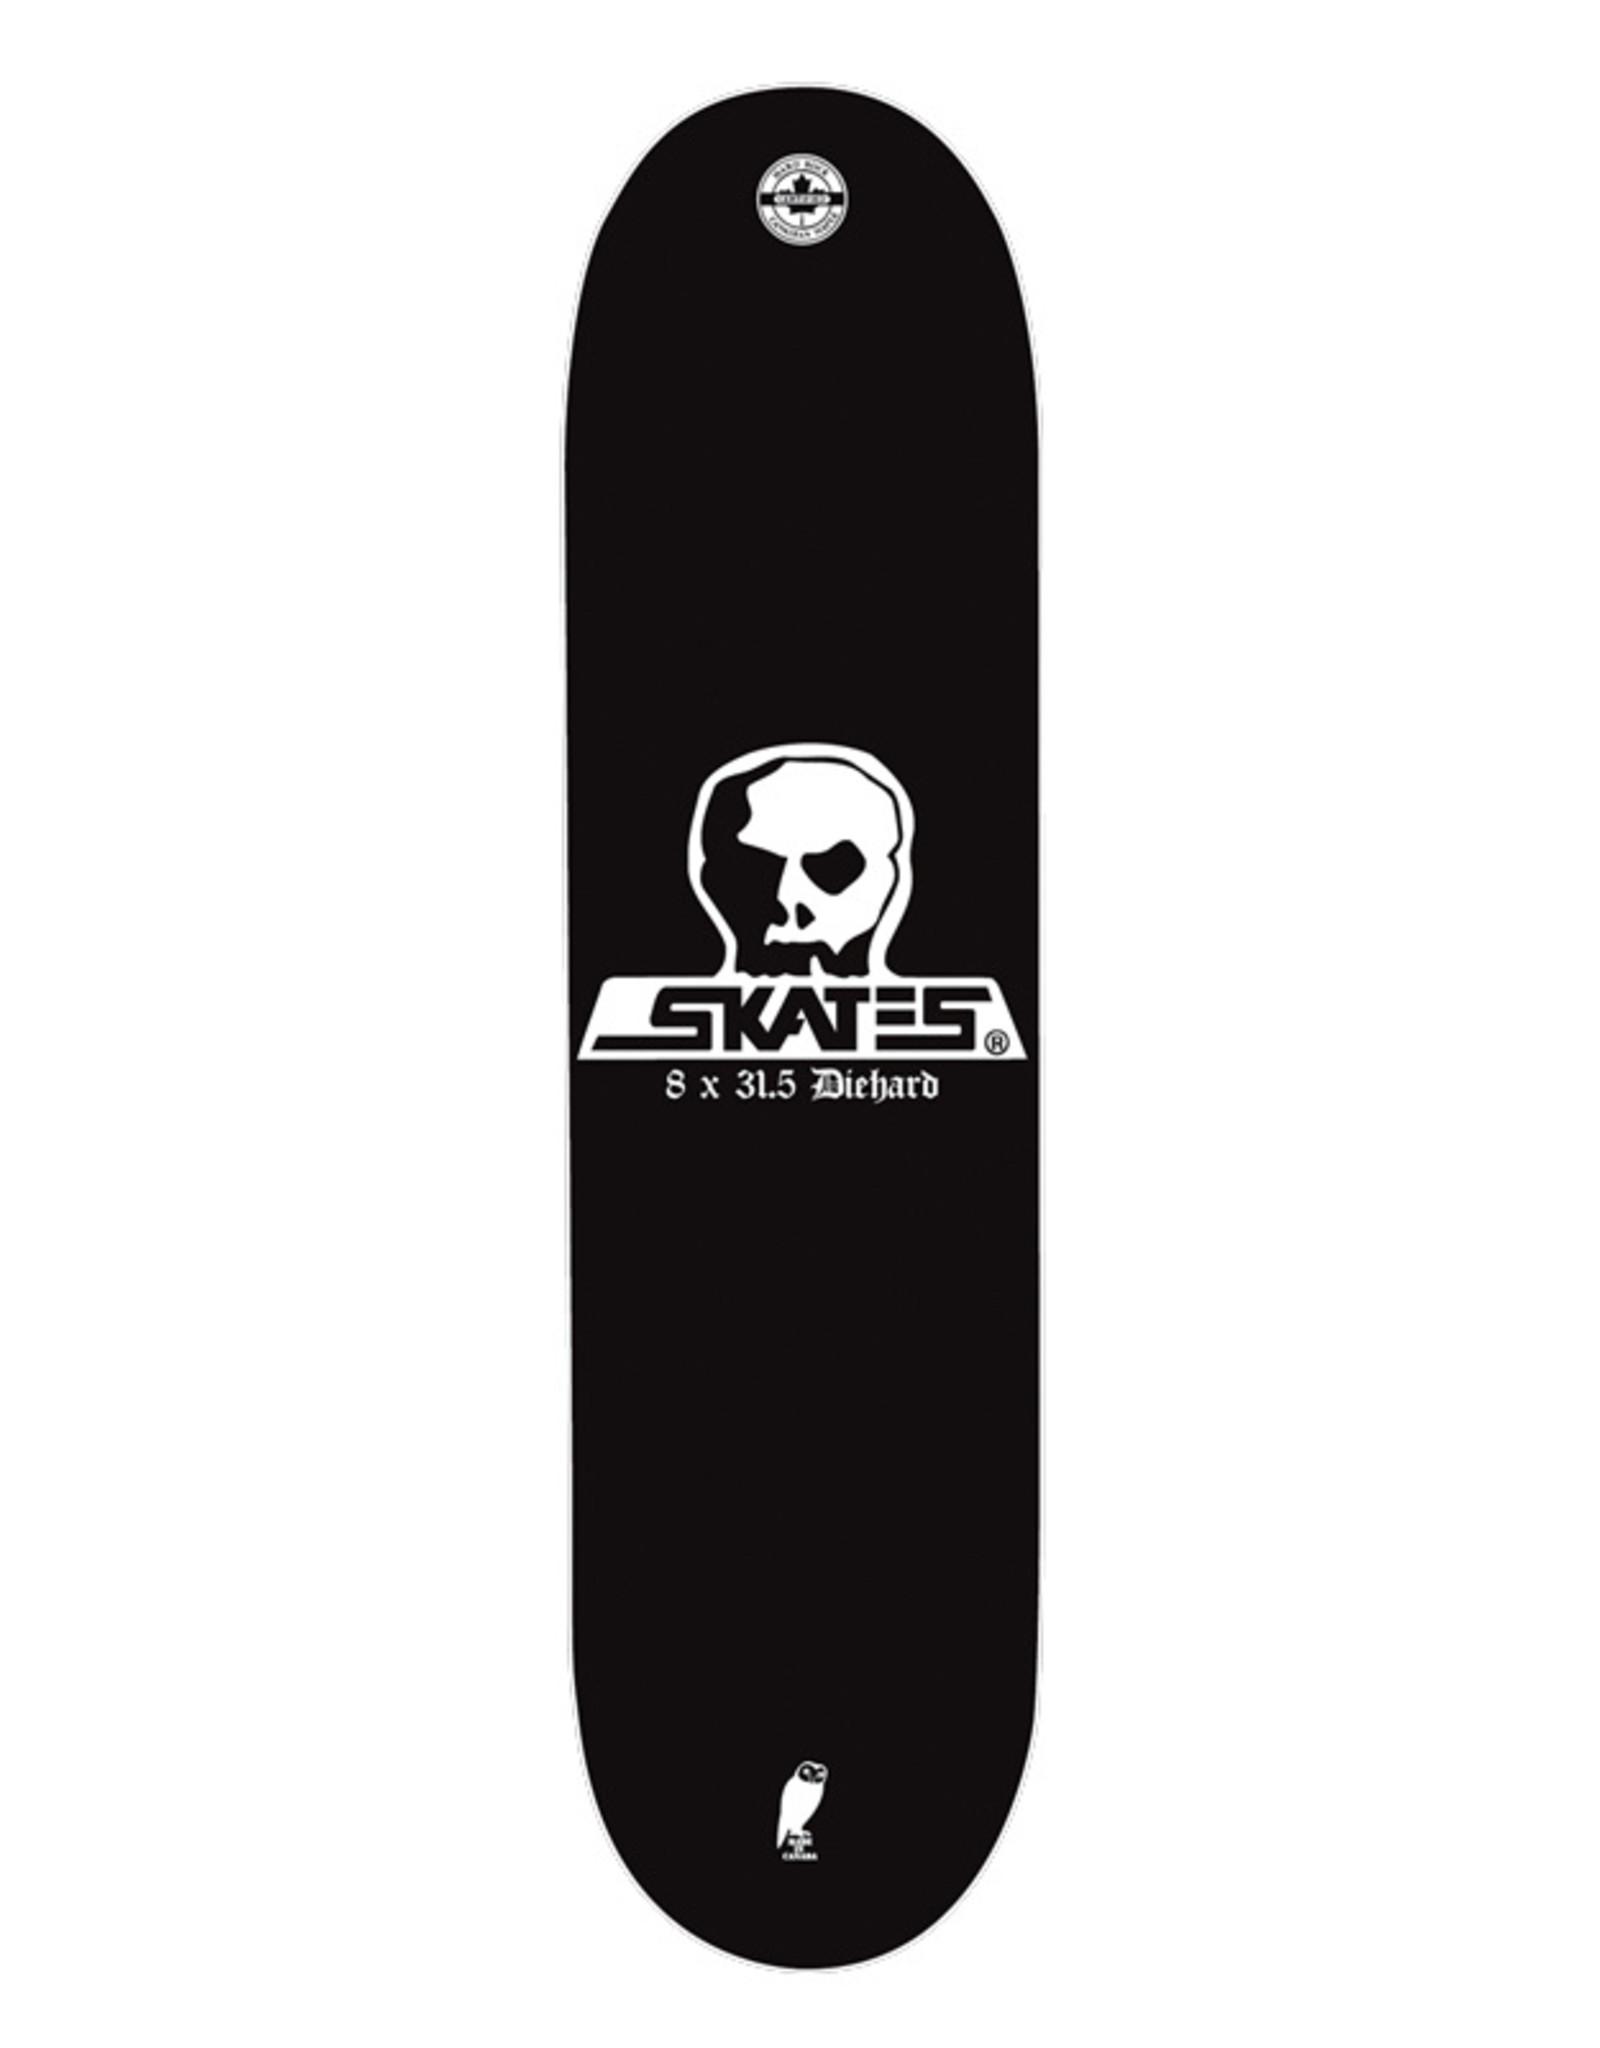 Skull Skates SKULL DECK DIEHARD 8x31.5